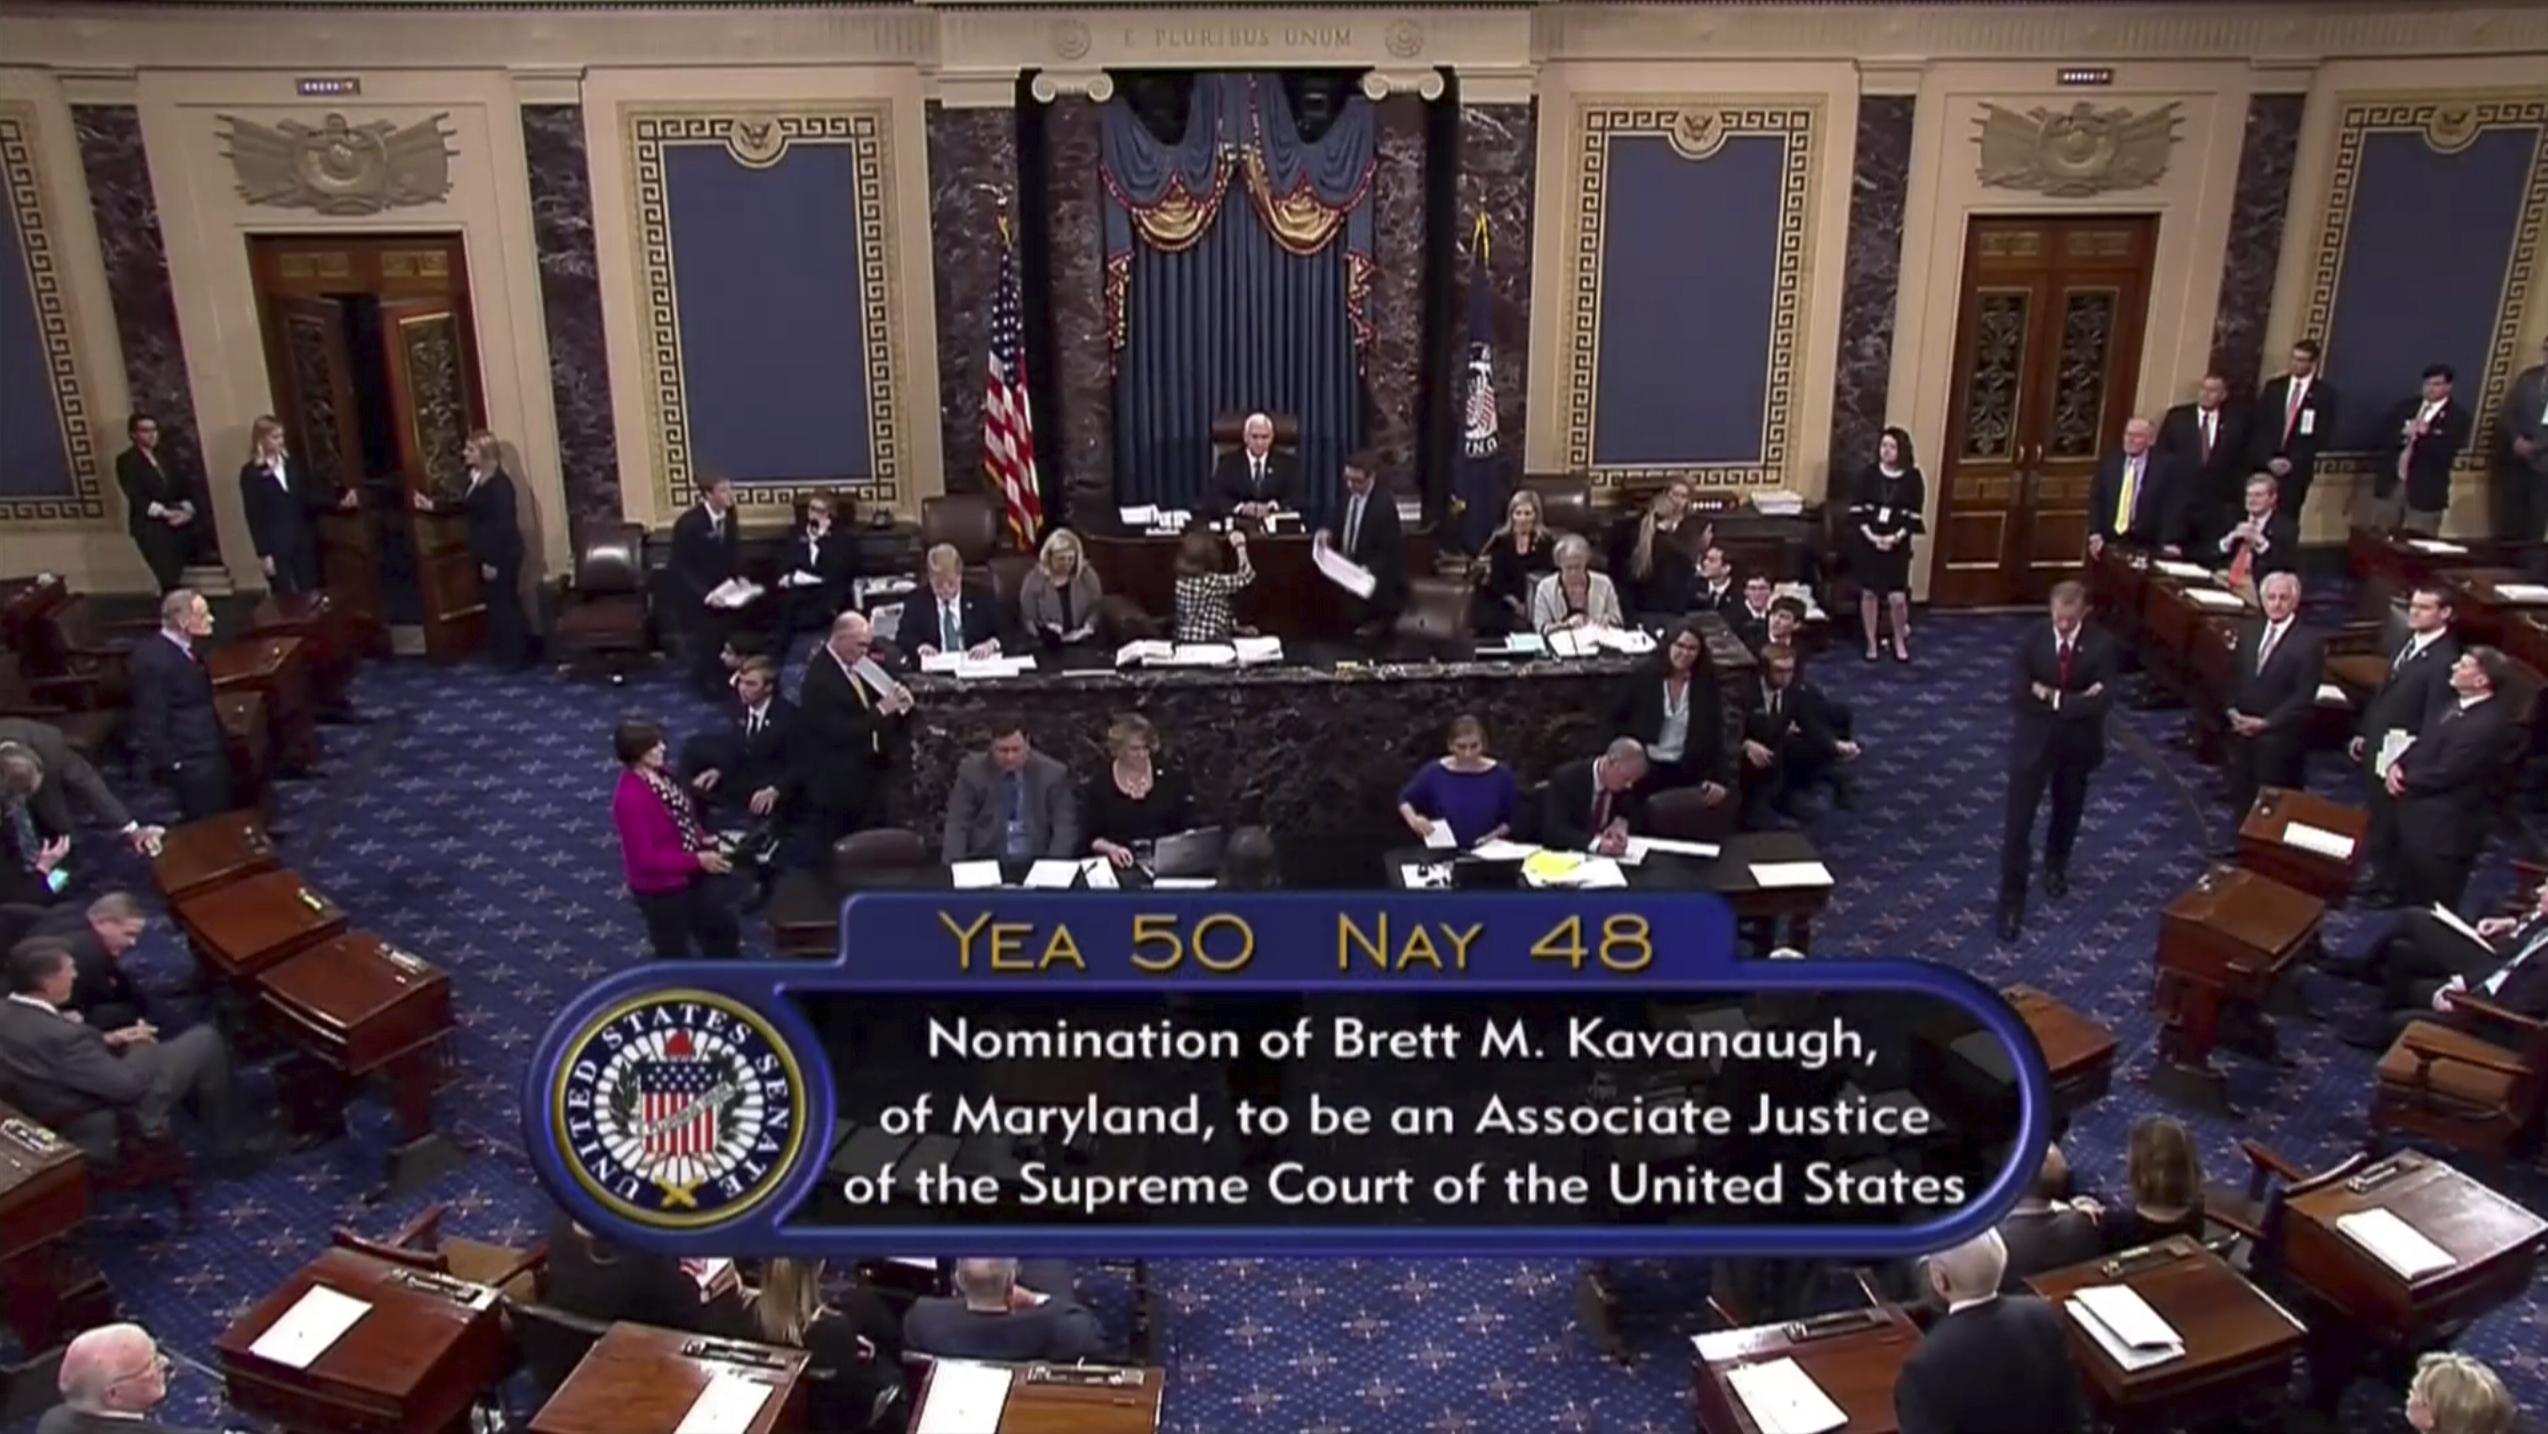 Supreme_Court_Kavanaugh_13628-159532.jpg16422248